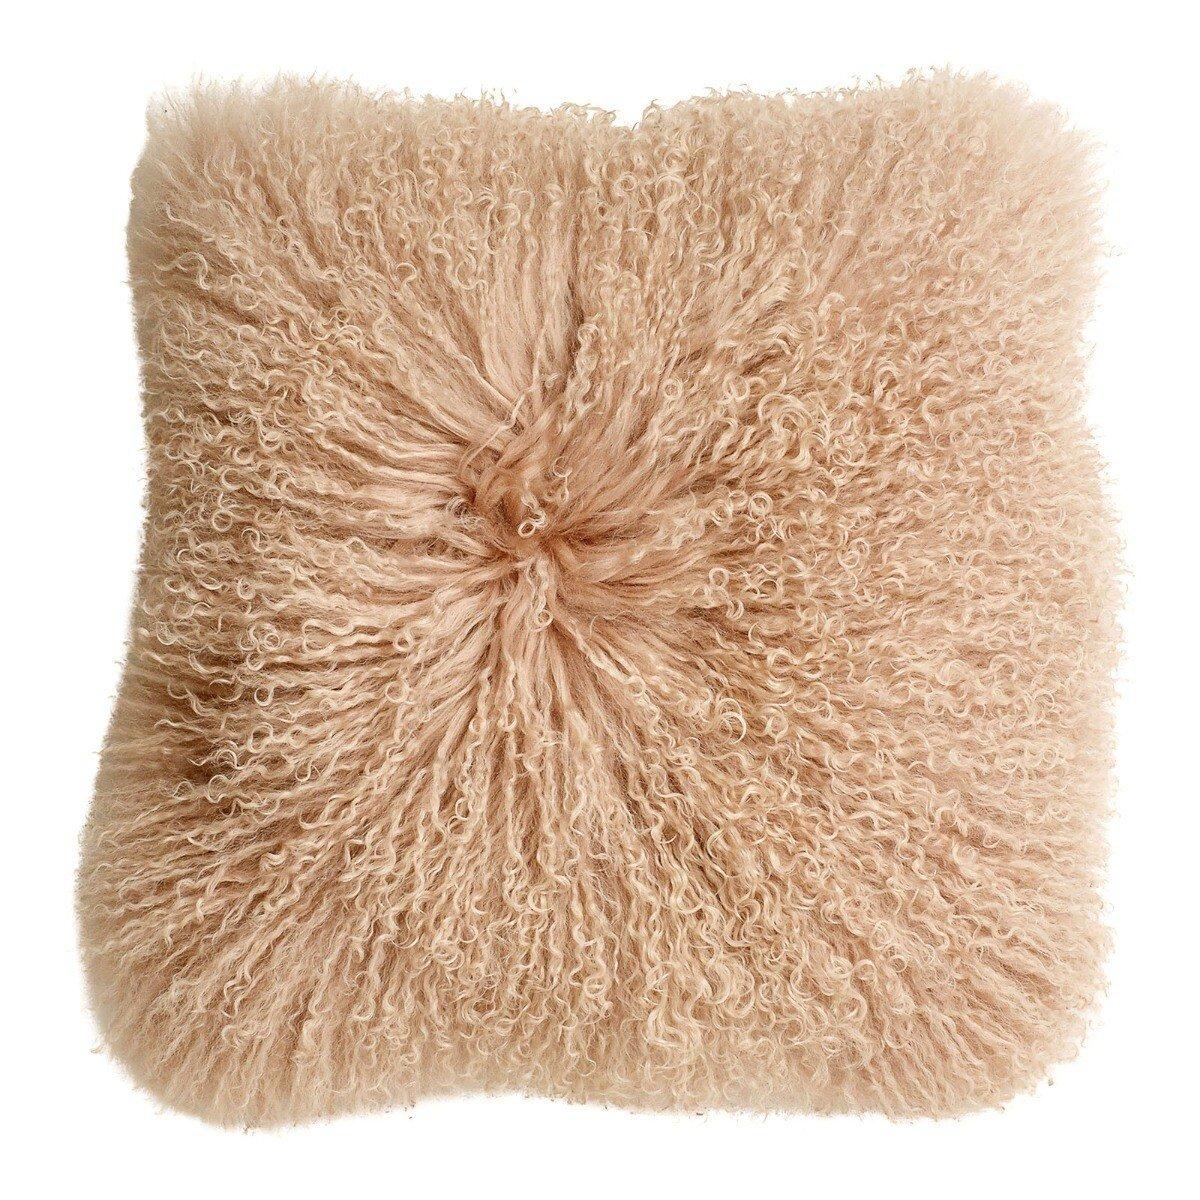 Nordal kussenhoes schapenvacht zacht roze 40 x 40